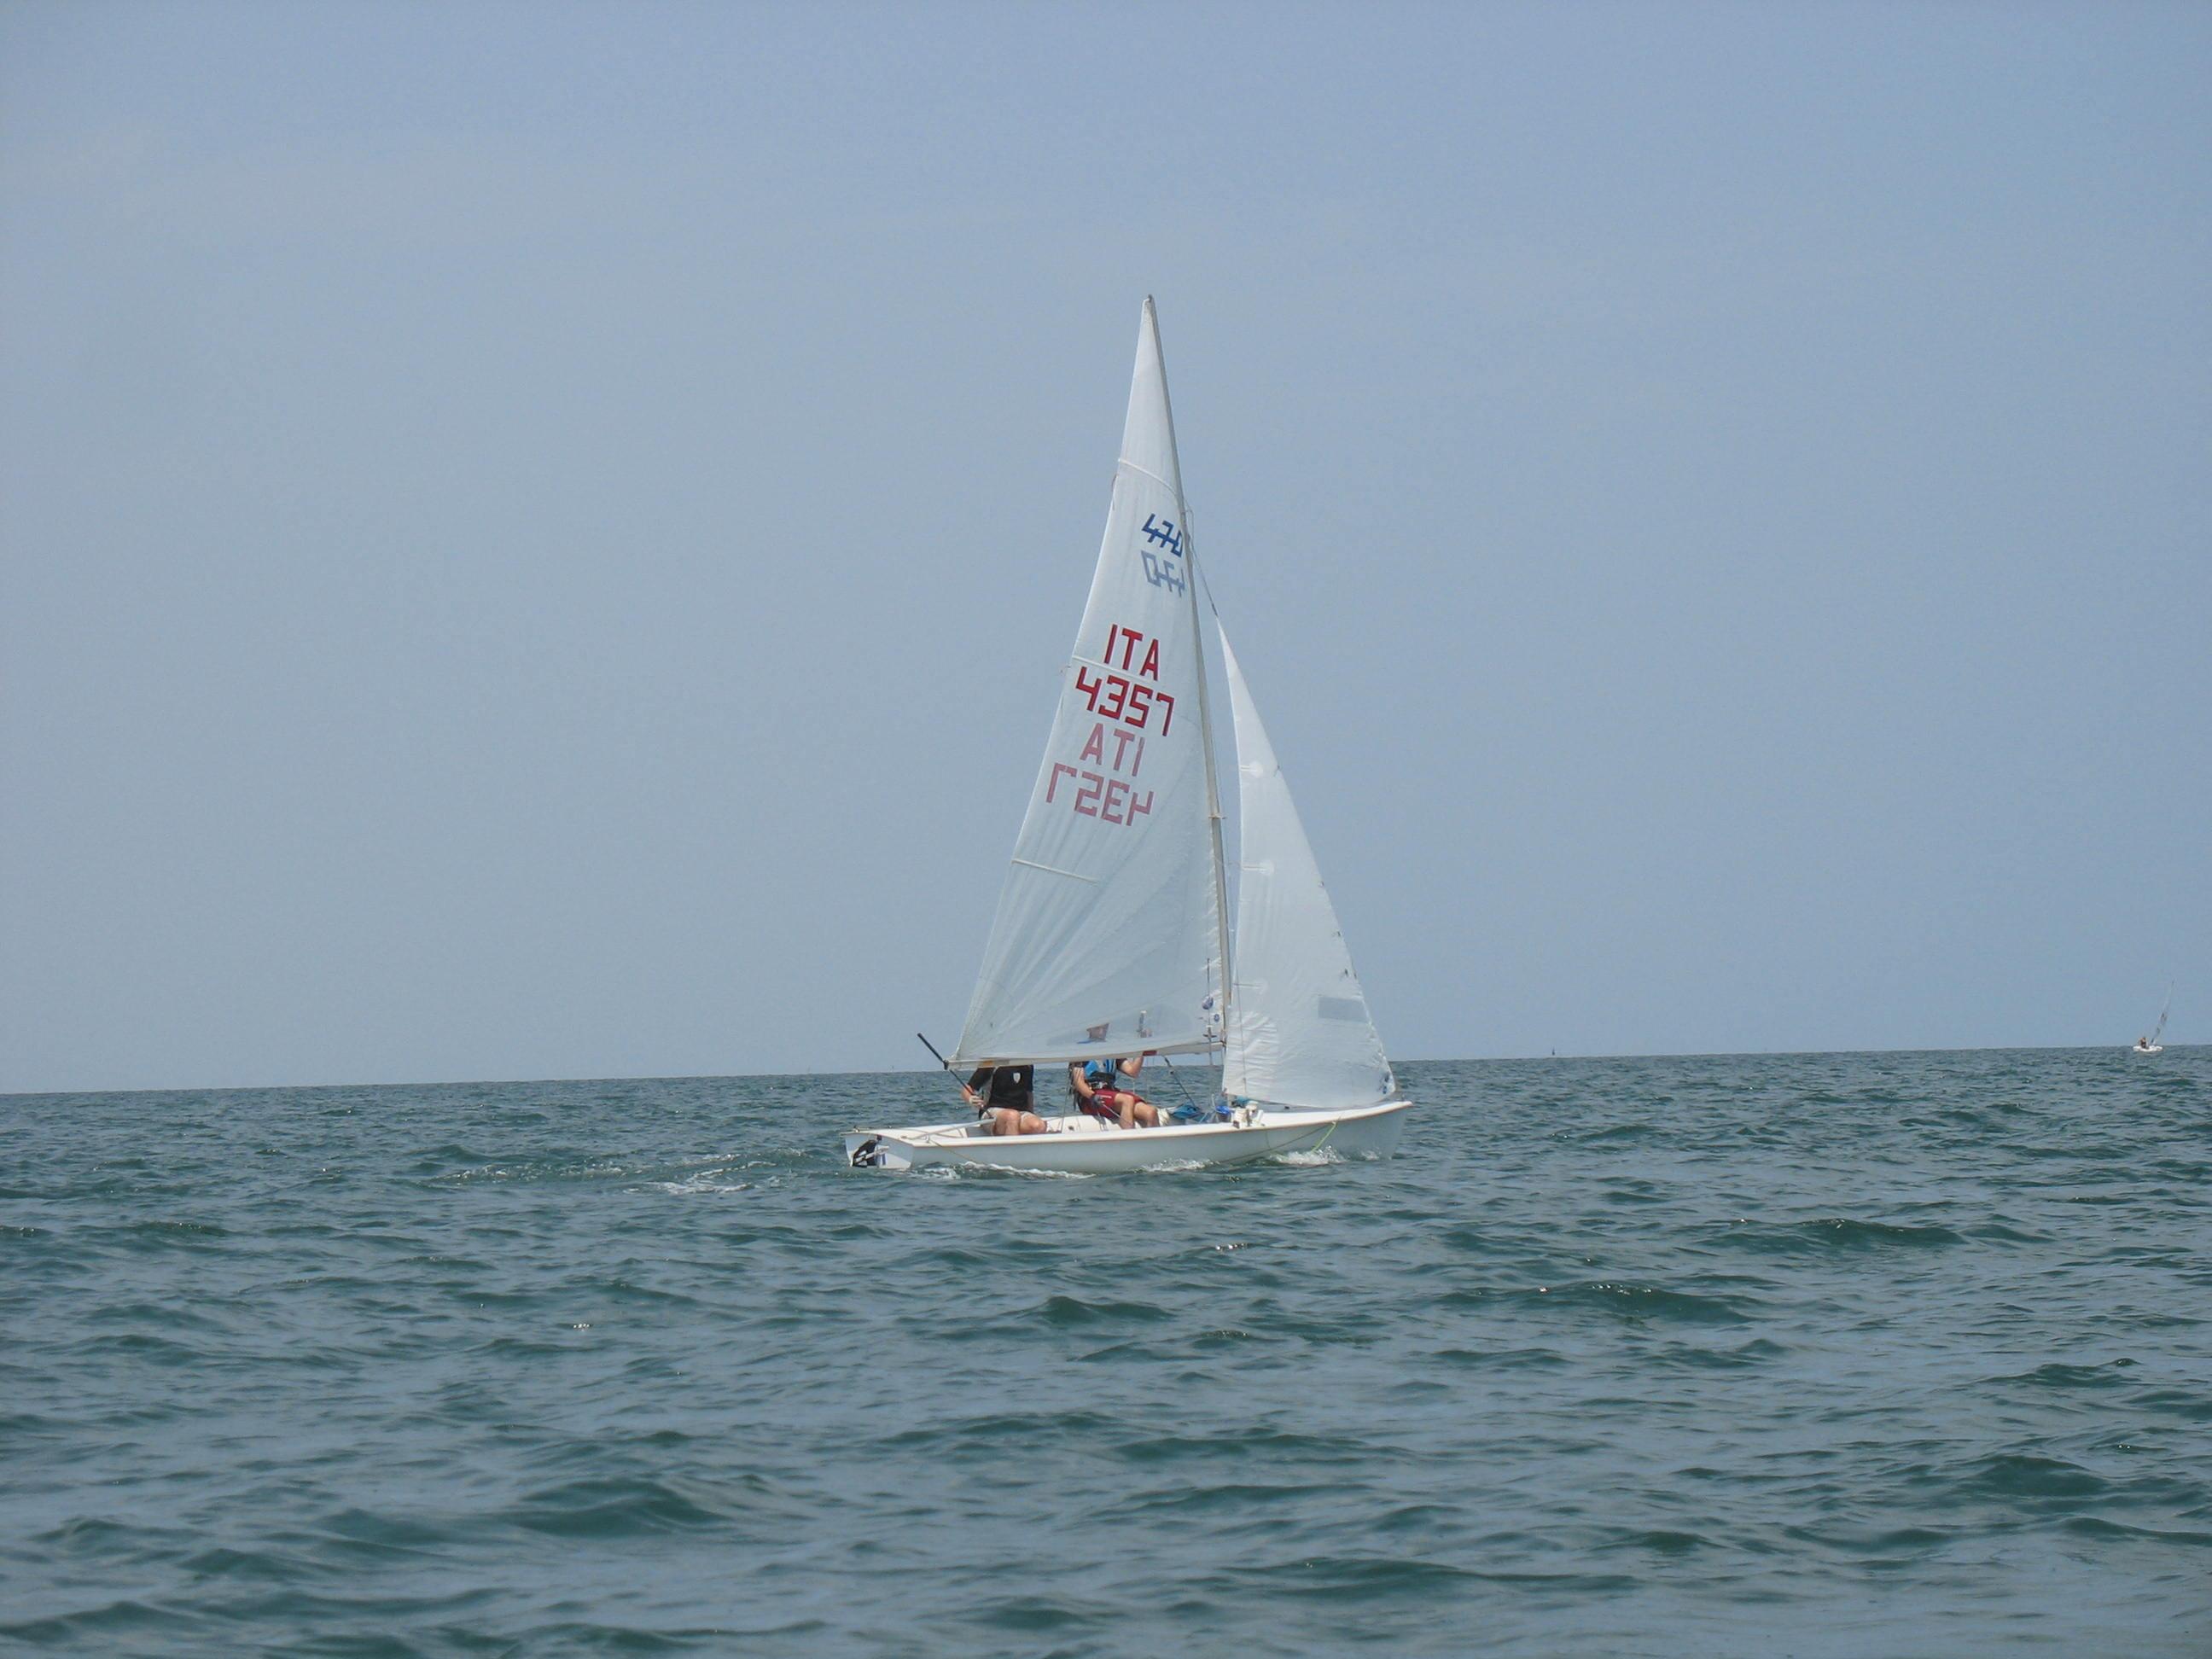 5-torneo-elia-tonelli-27062010-061